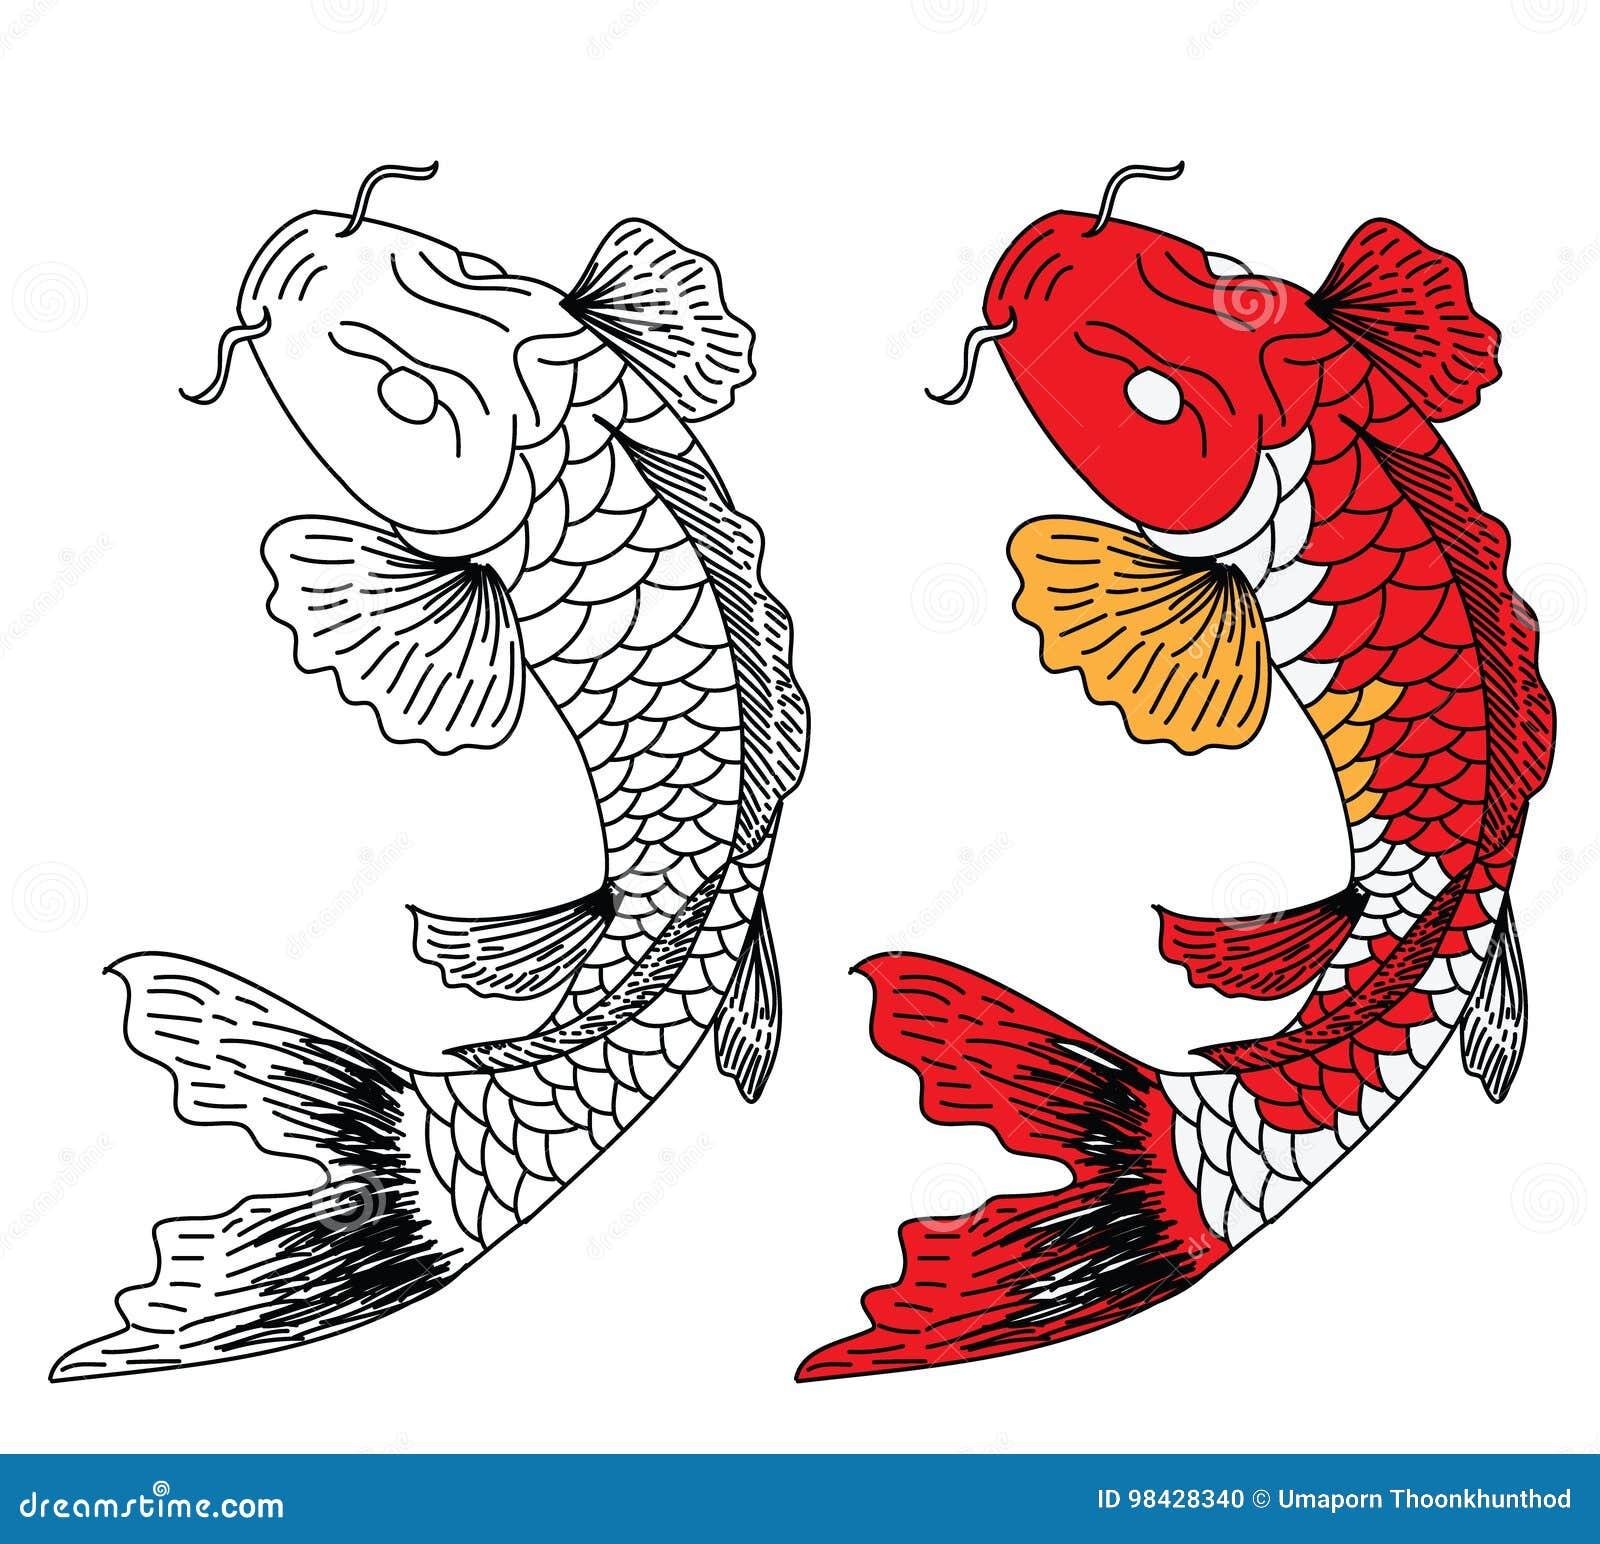 Japanese Koifish Tattoo Design Vector Stock Vector - Illustration of ...